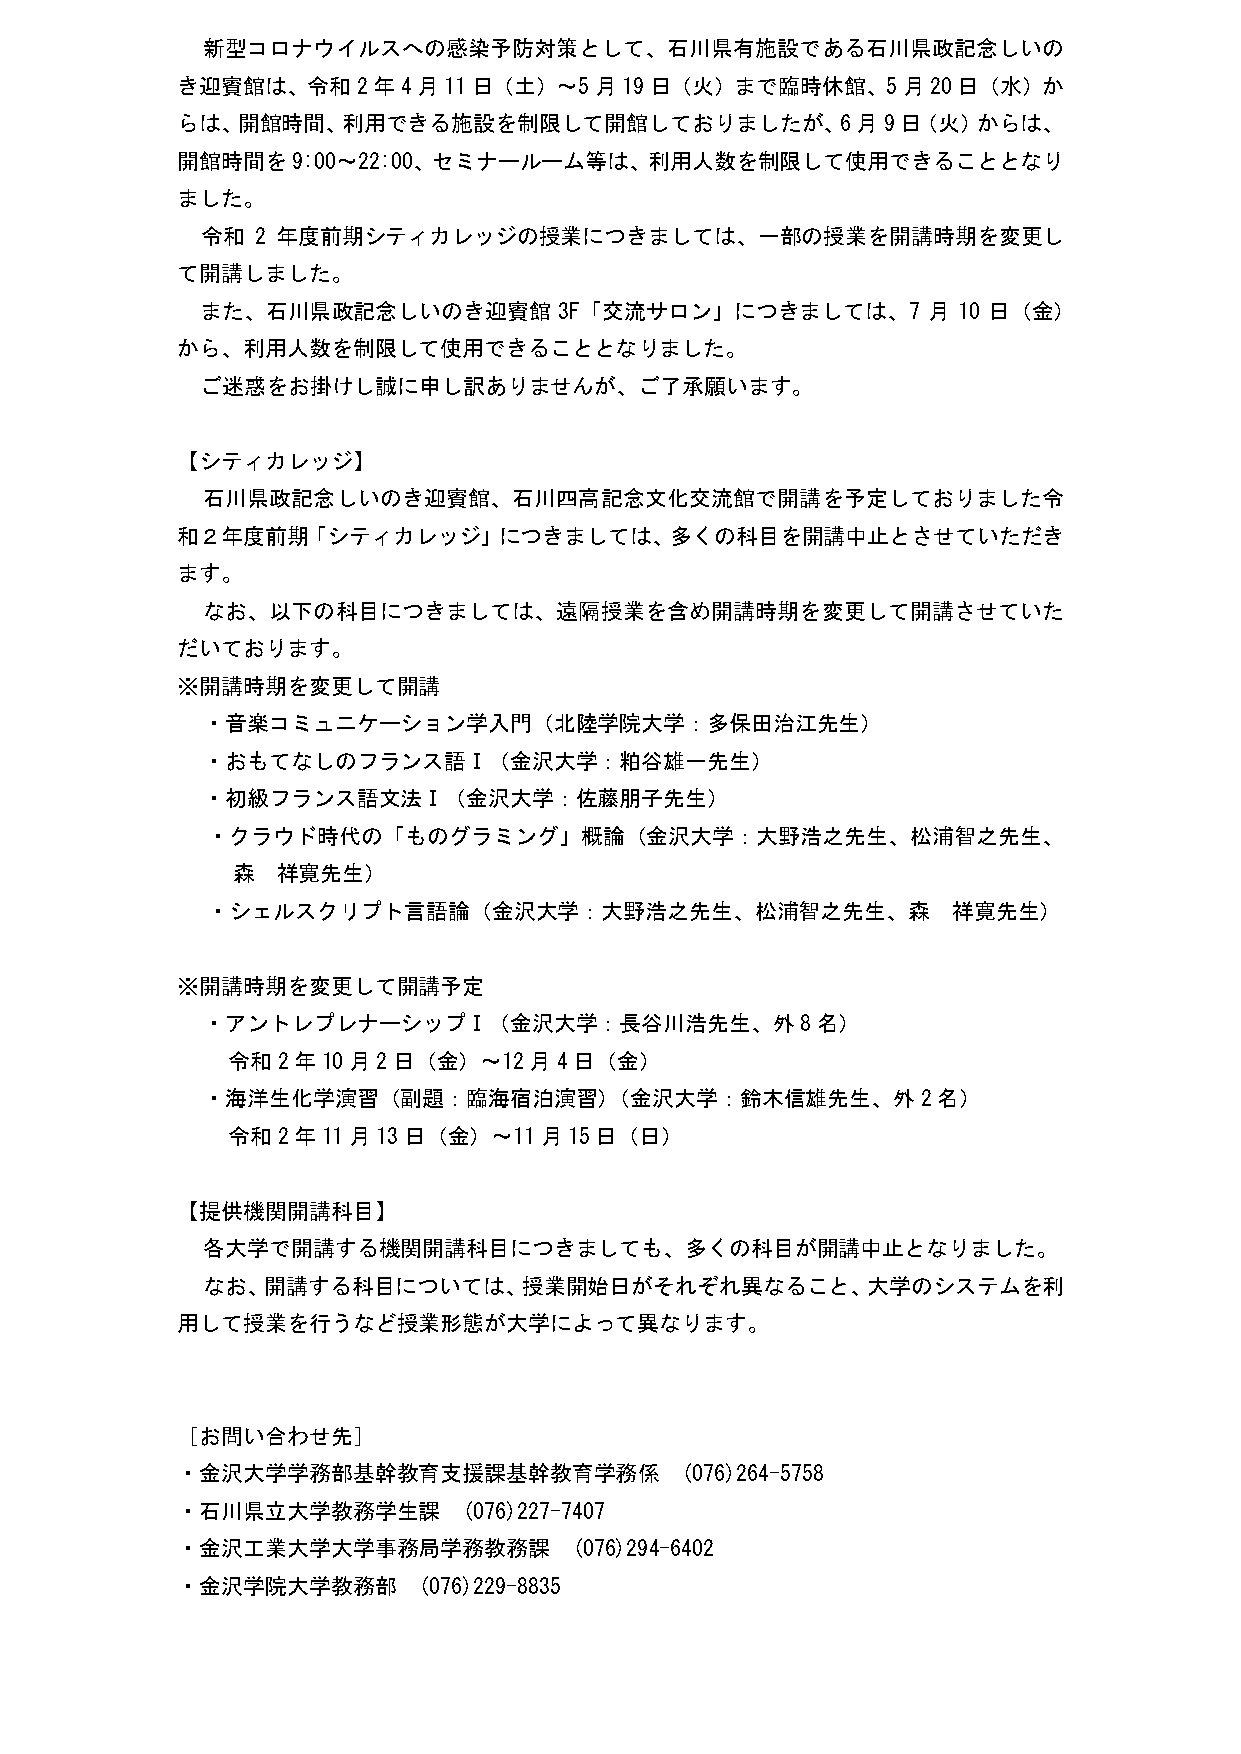 closure_info4.jpg